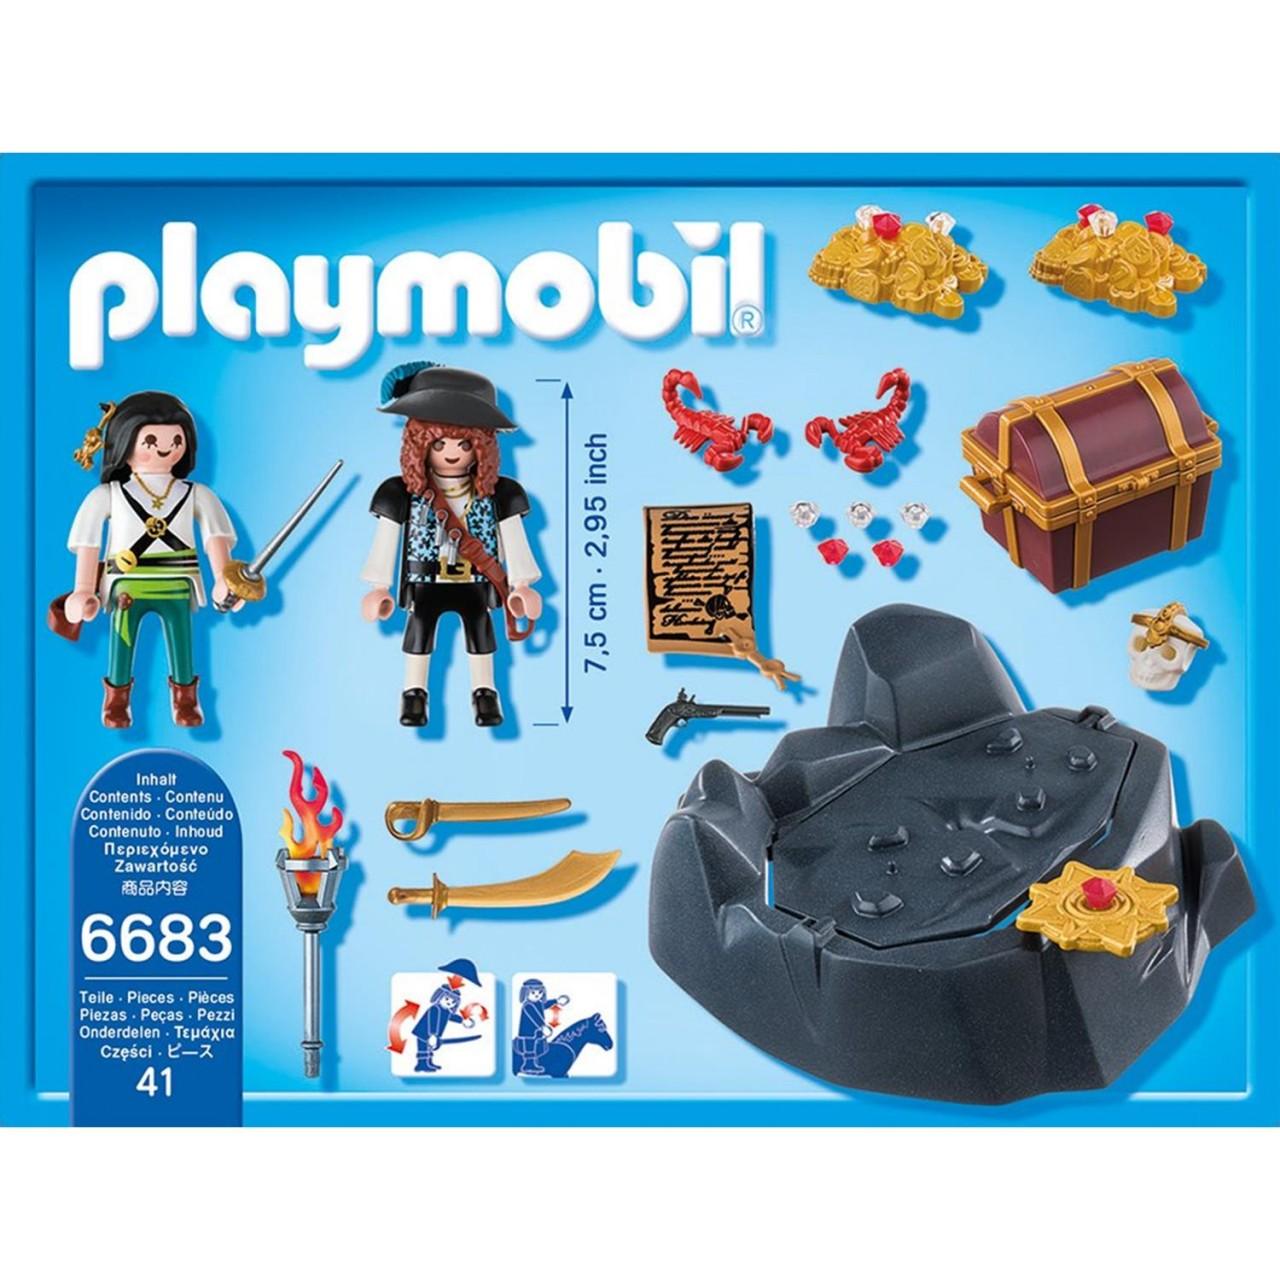 Playmobil 6683 Piraten-Schatzversteck